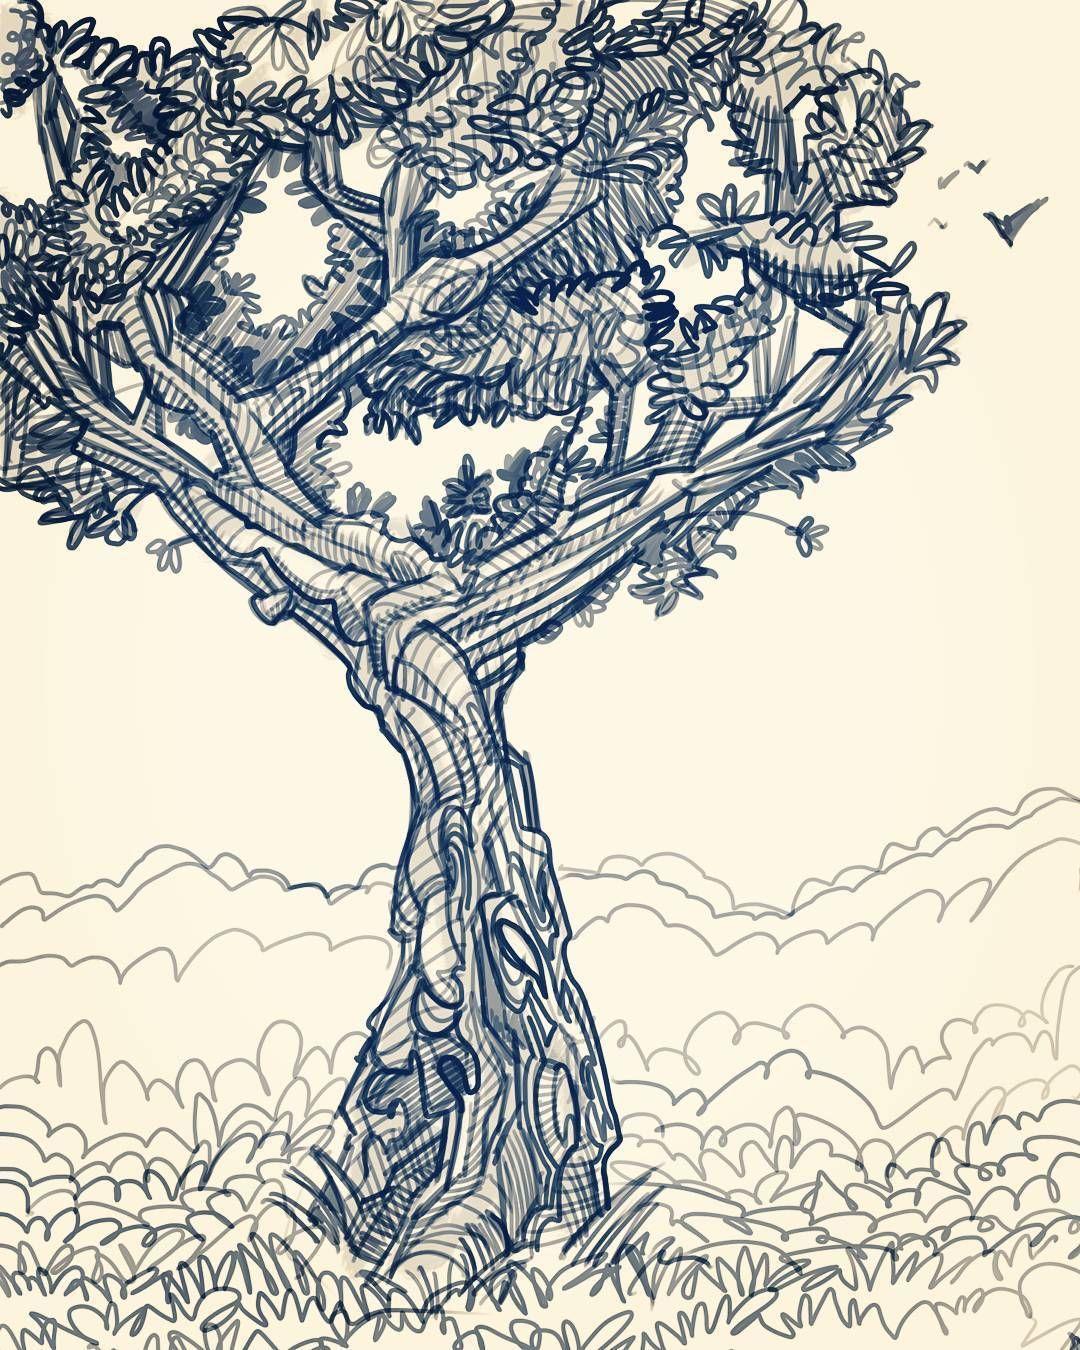 Little Imaginary Tree Sketchbook Sketching Sketch Artistsjournal Artjournal Instaart Instagood Art Artist Graphic Pen Ink Drawings Art Insta Art [ 1350 x 1080 Pixel ]